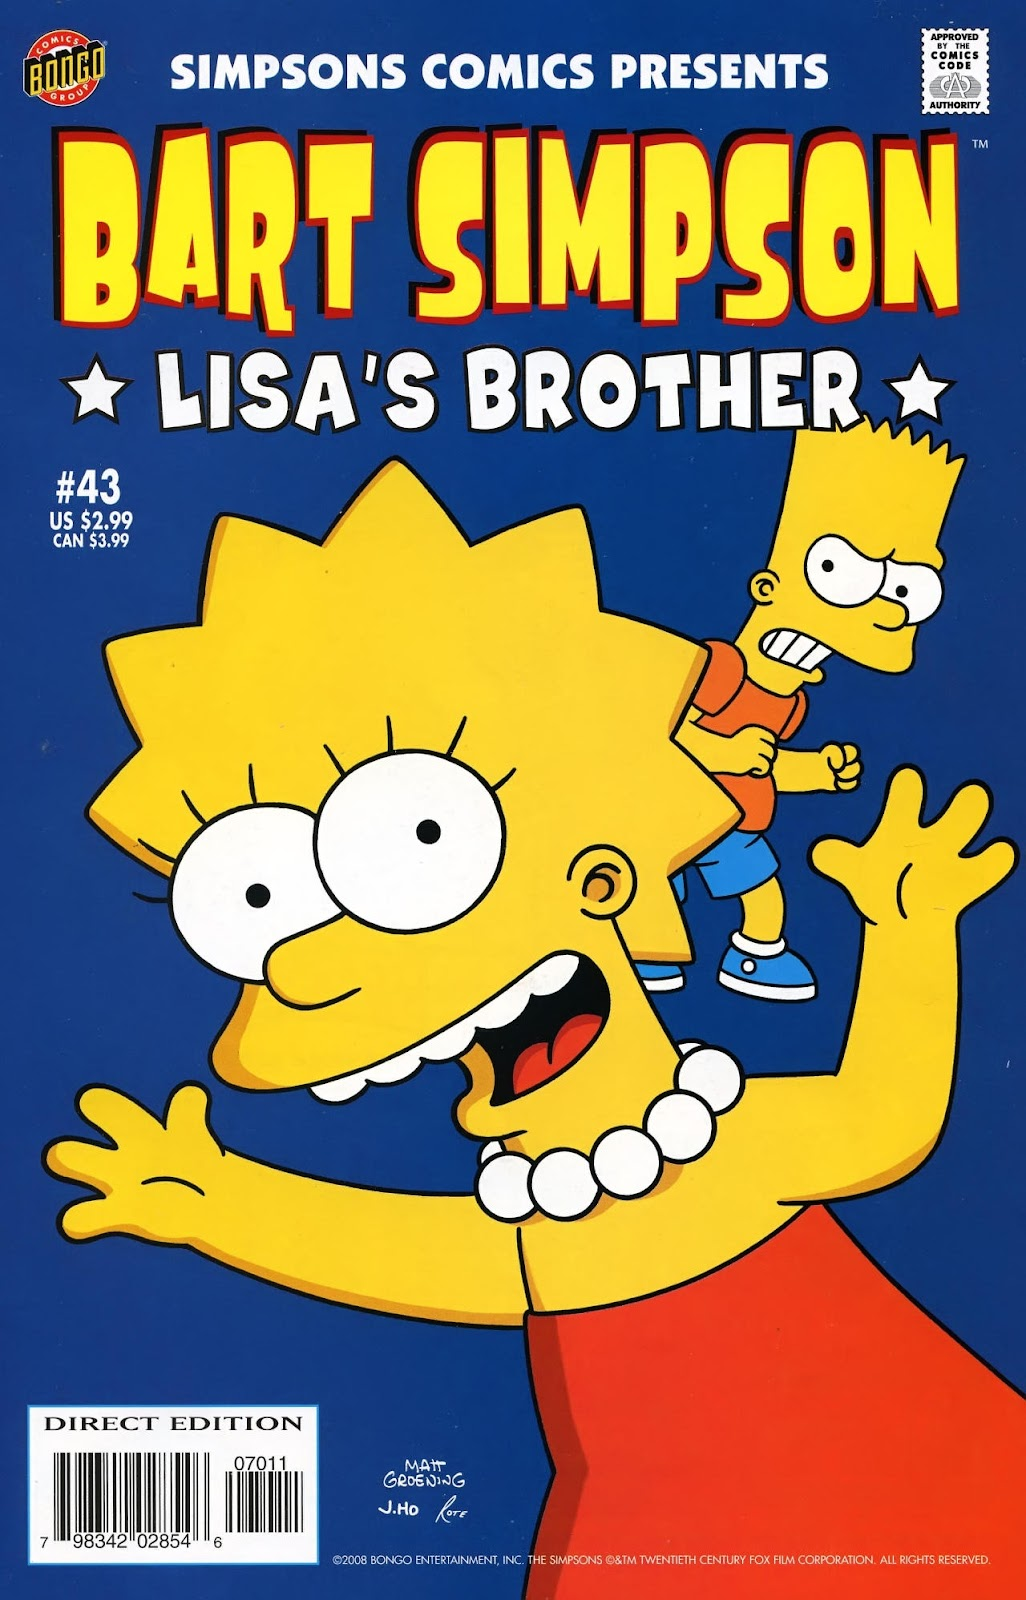 Simpsons Comics Presents Bart Simpson 43 Page 1